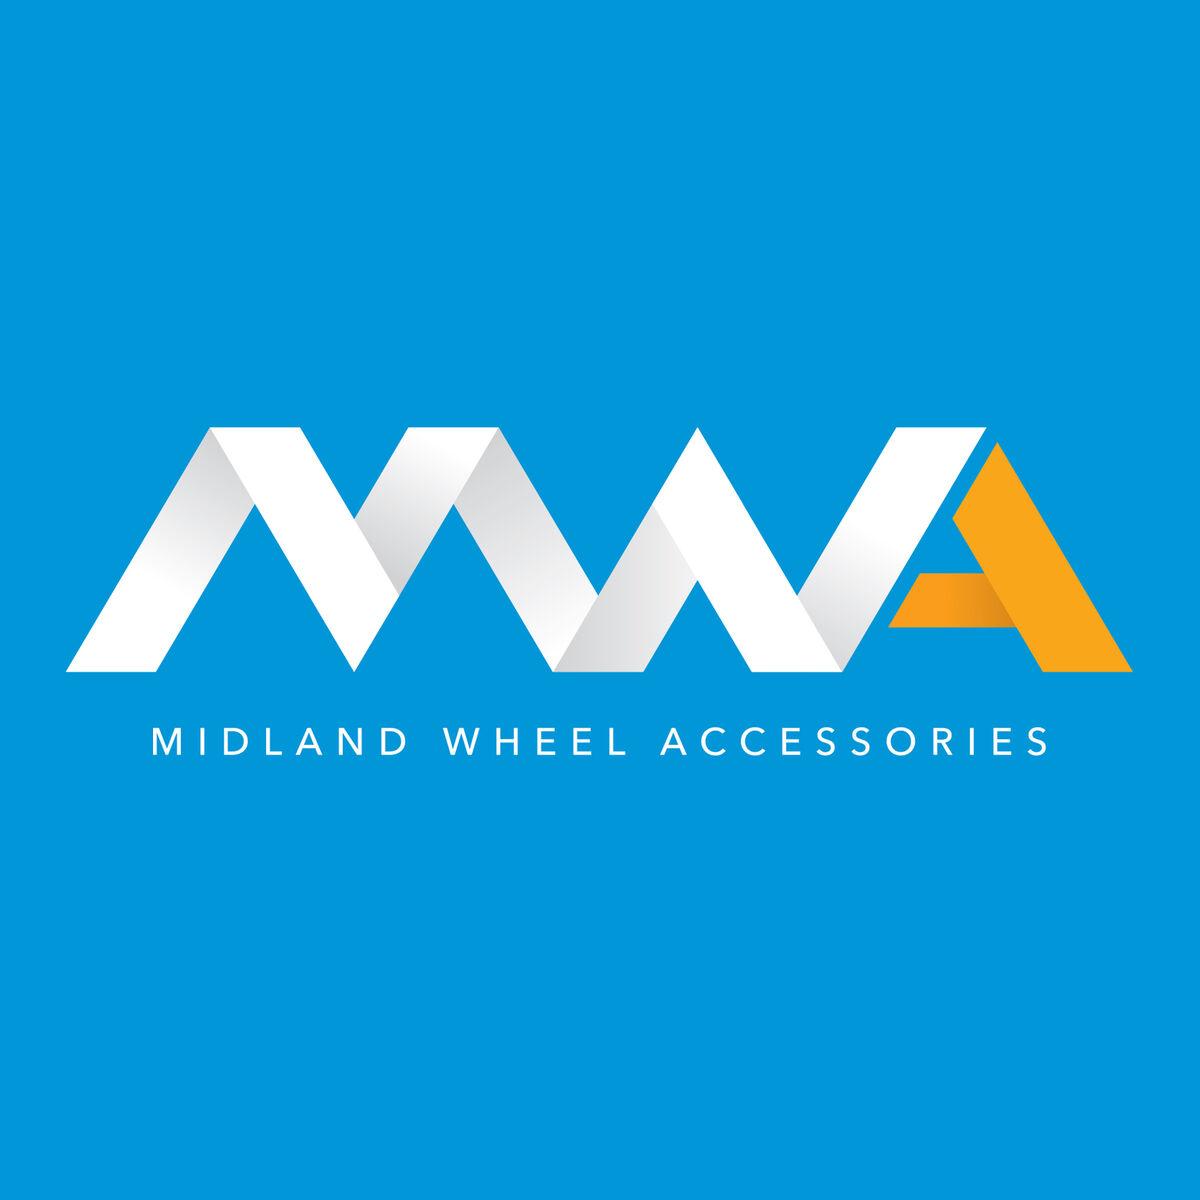 midlandwheelaccessories